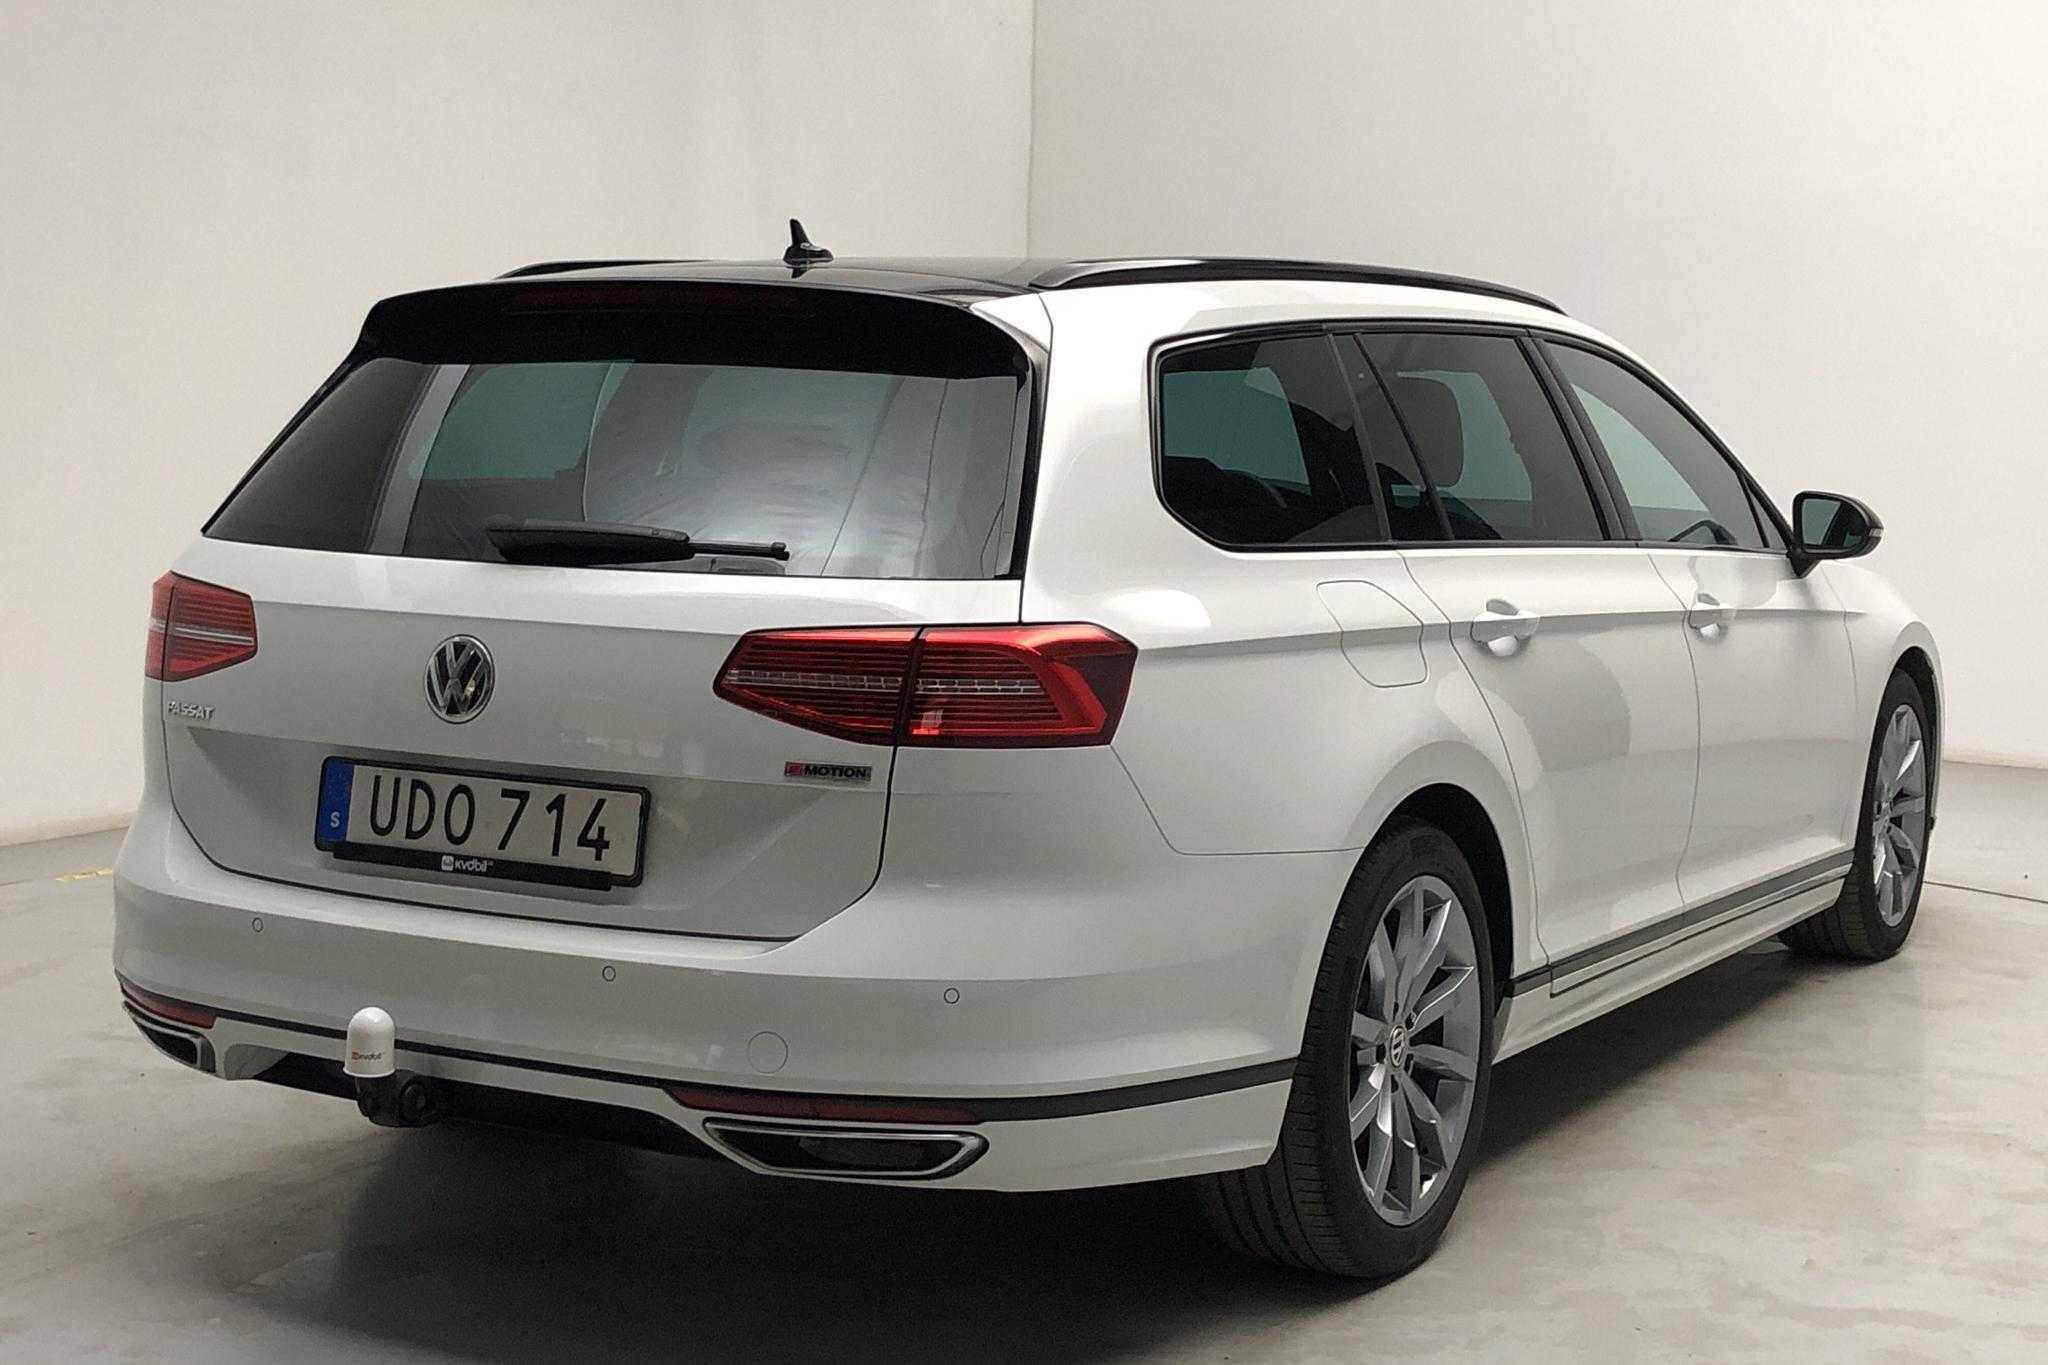 VW Passat 2.0 TSI Sportscombi 4Motion (272hk) - 45 060 km - Automatic - white - 2019